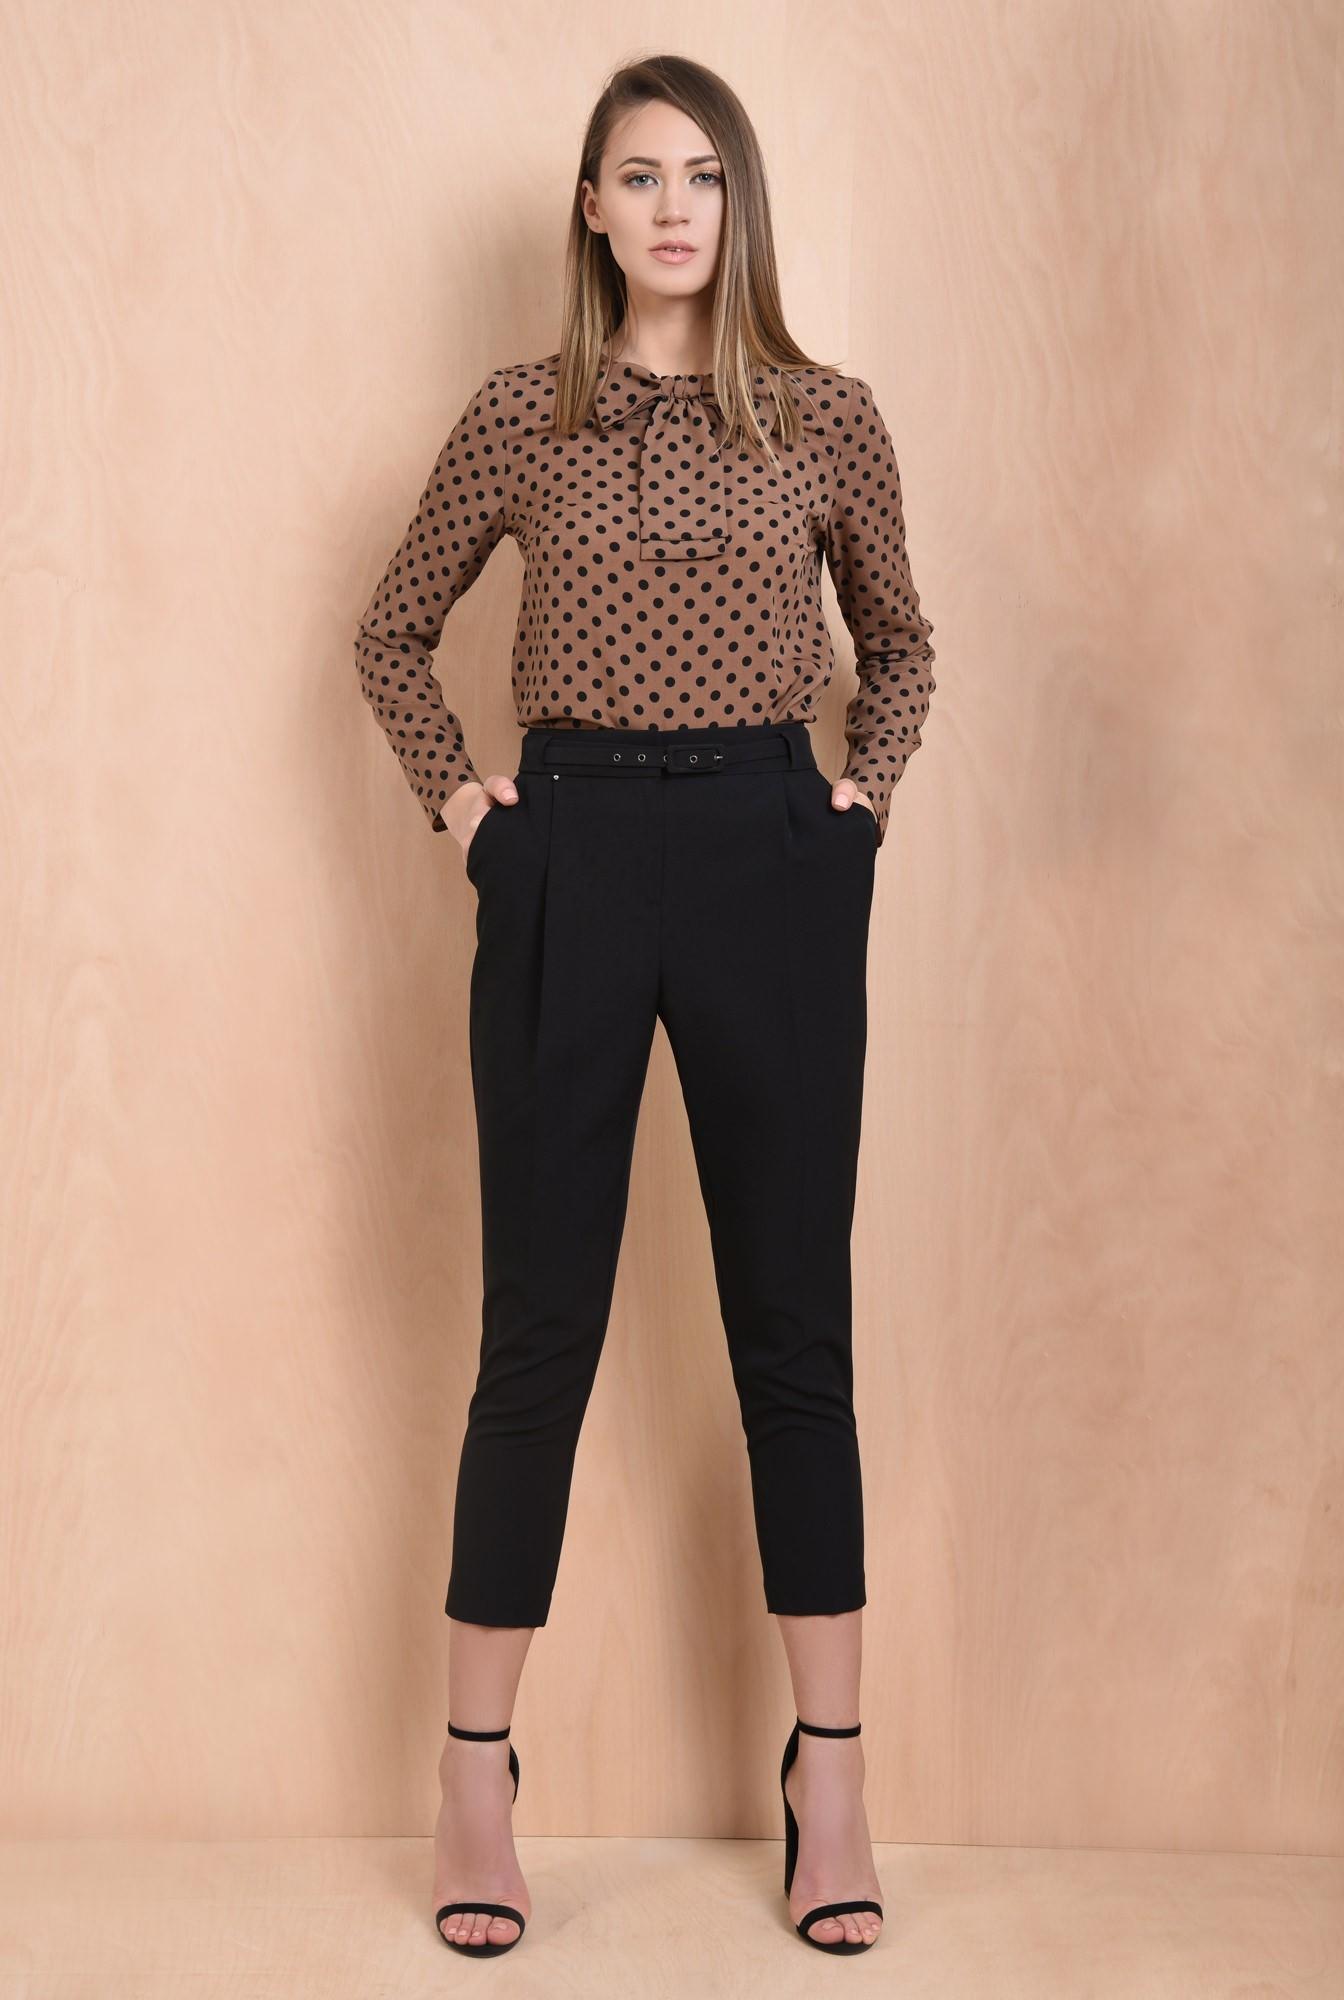 0 - pantaloni de zi, negri, office, de birou, centura ingusta